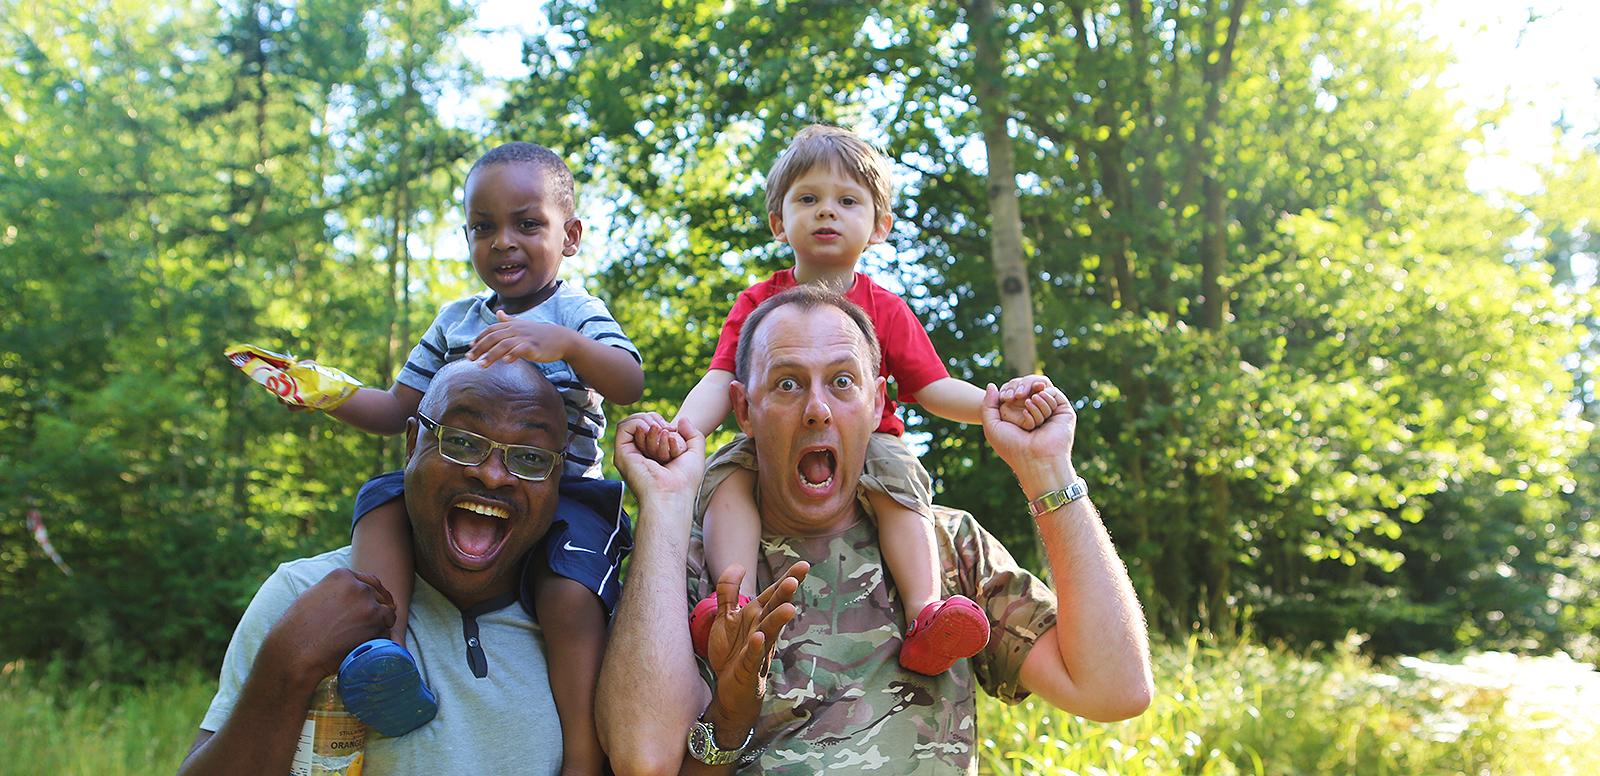 Cheap Family Holidays  Go Camping  Beech Estate Campsite